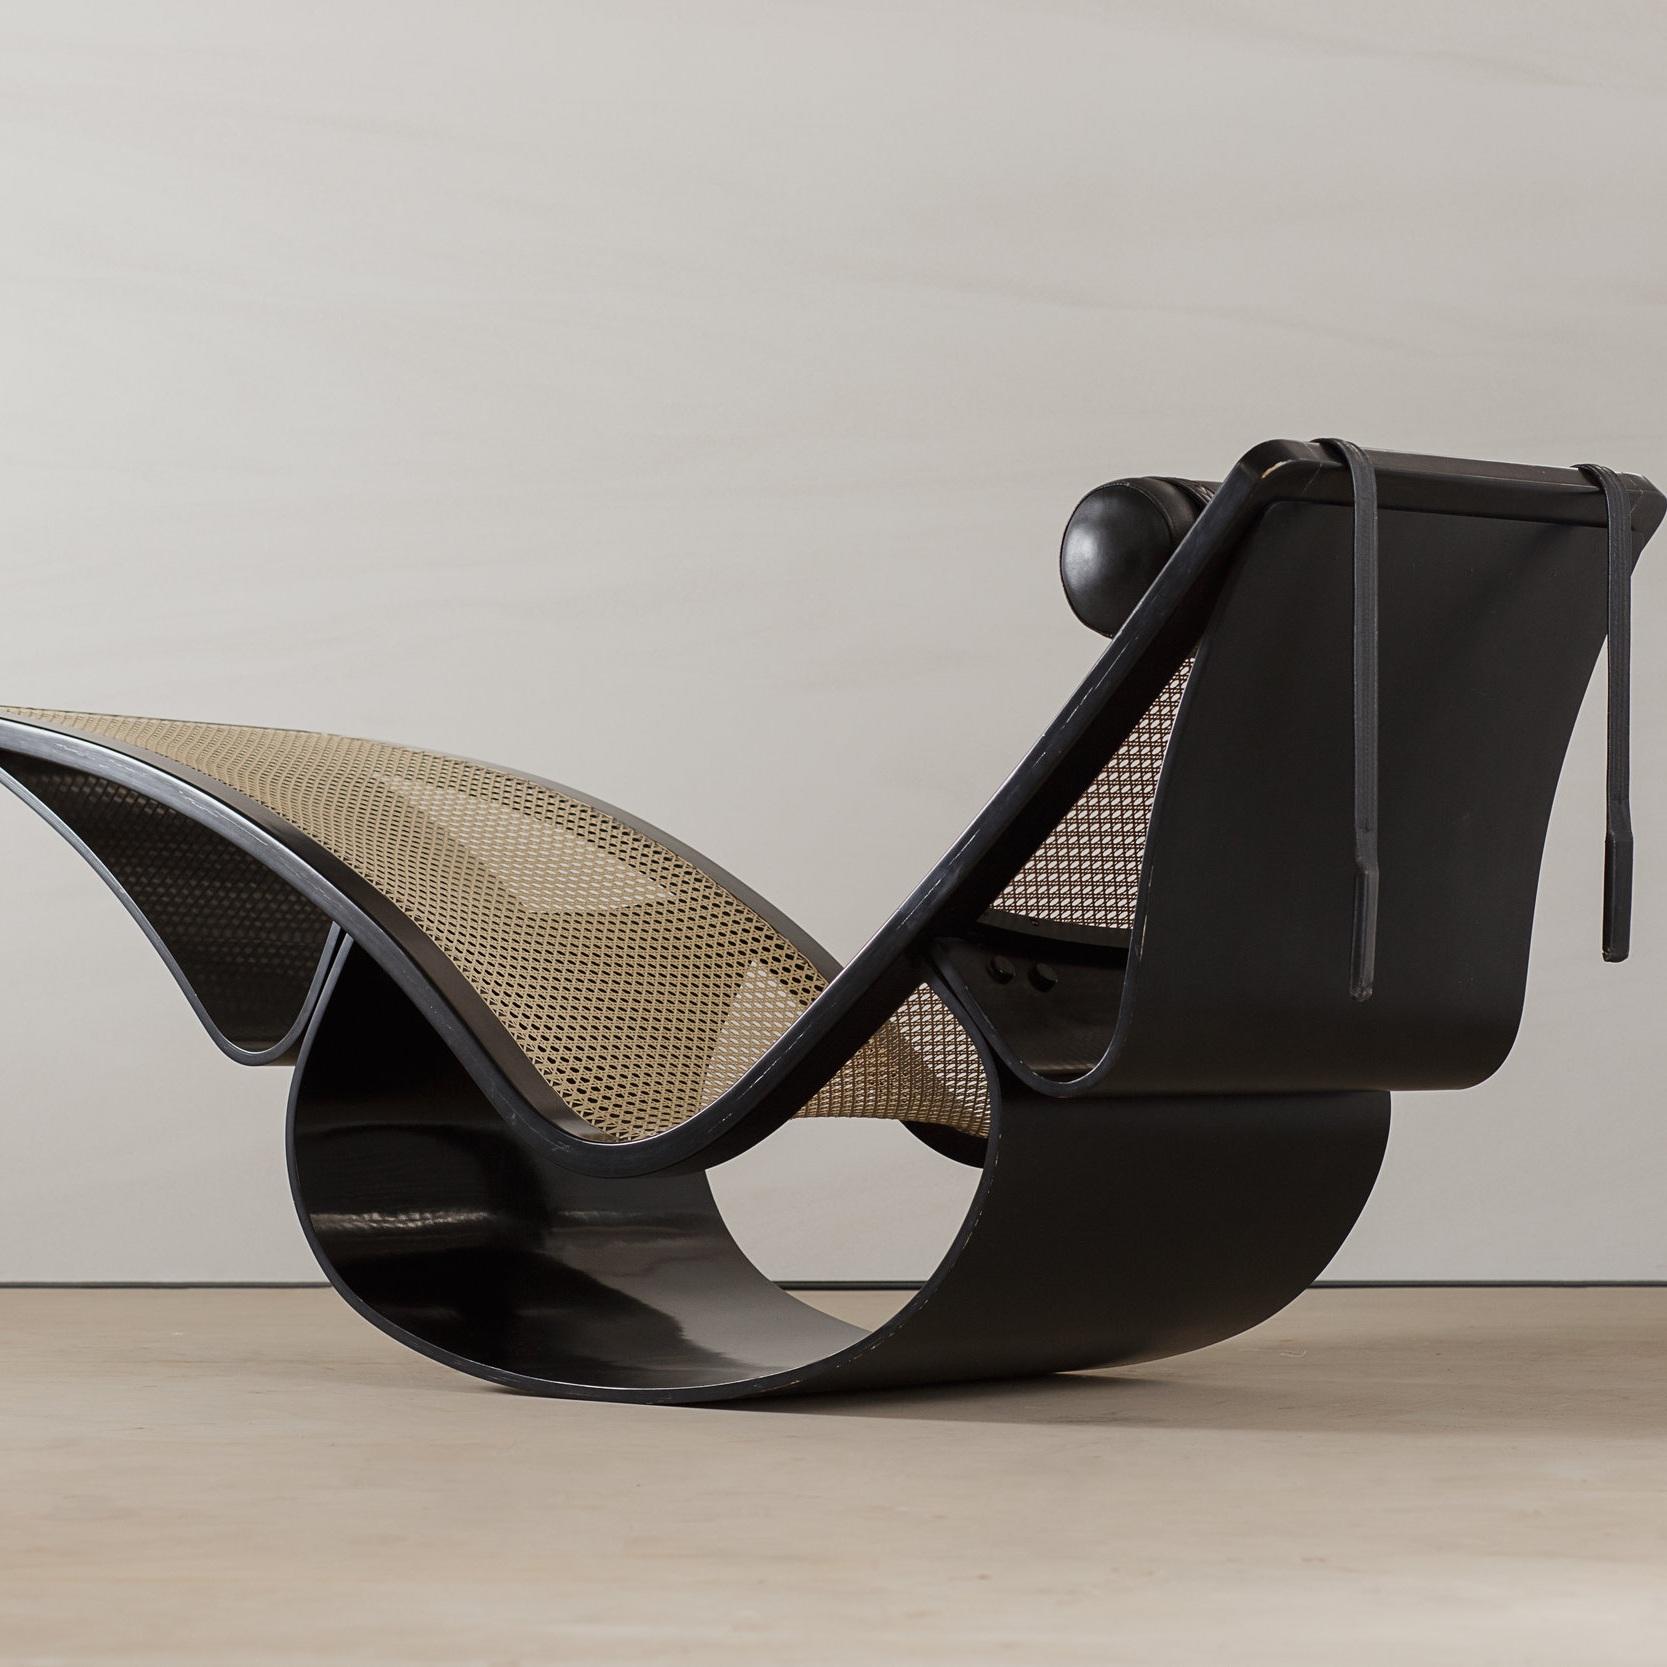 rio chaise   oscar niemeyer -